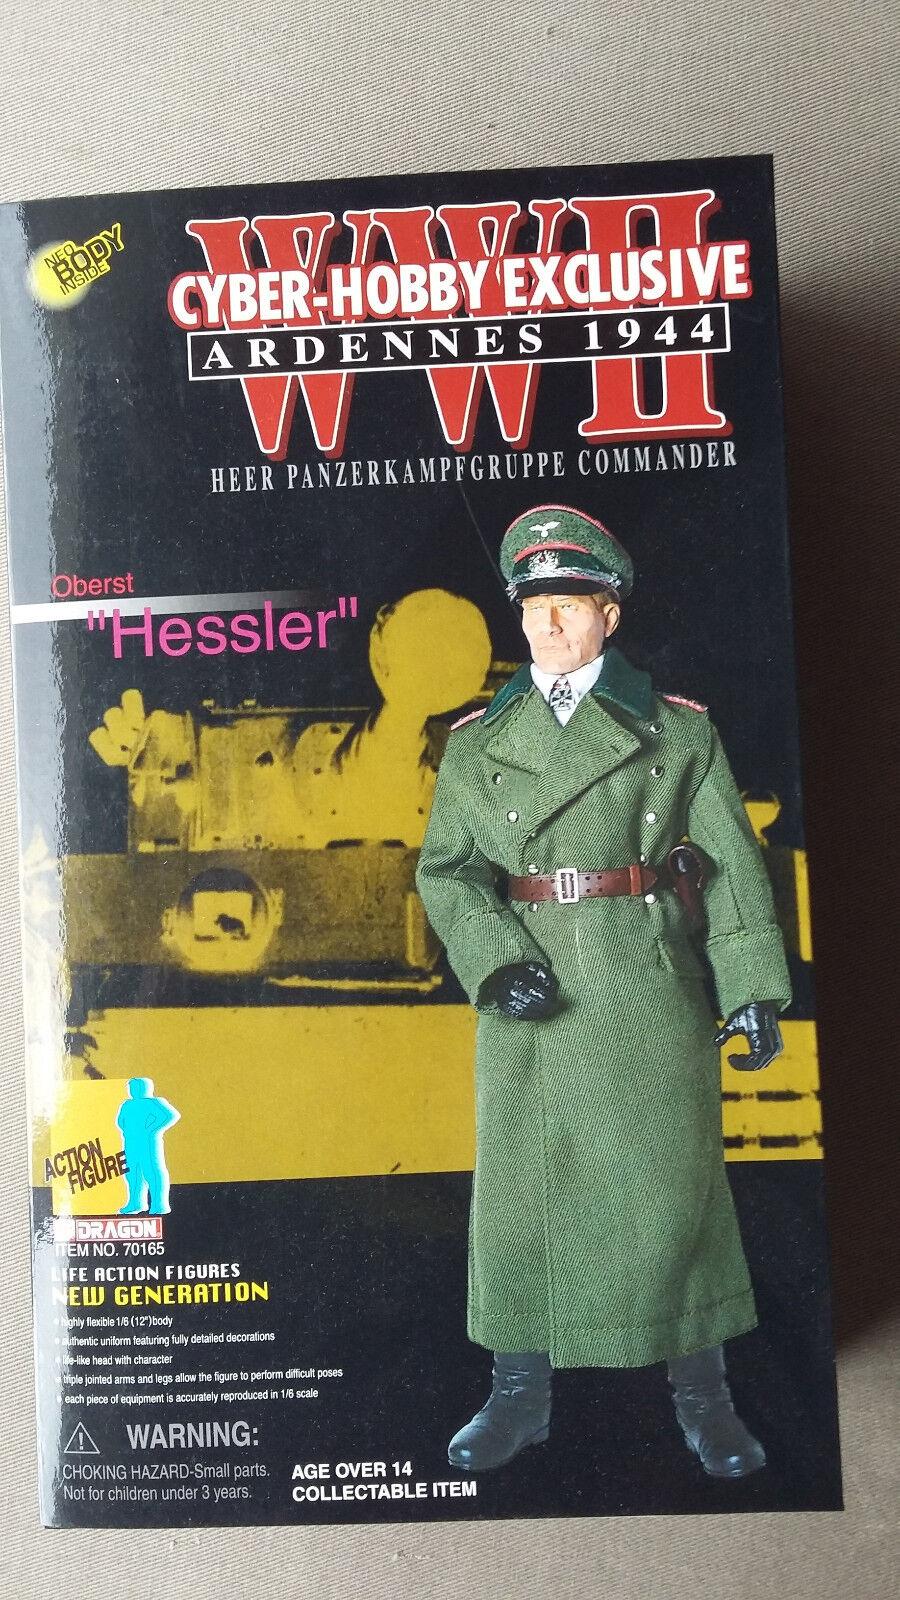 Dragon Ardennes 1944 Oberst Hessler Heer Panzerkampfgruppe Kommander